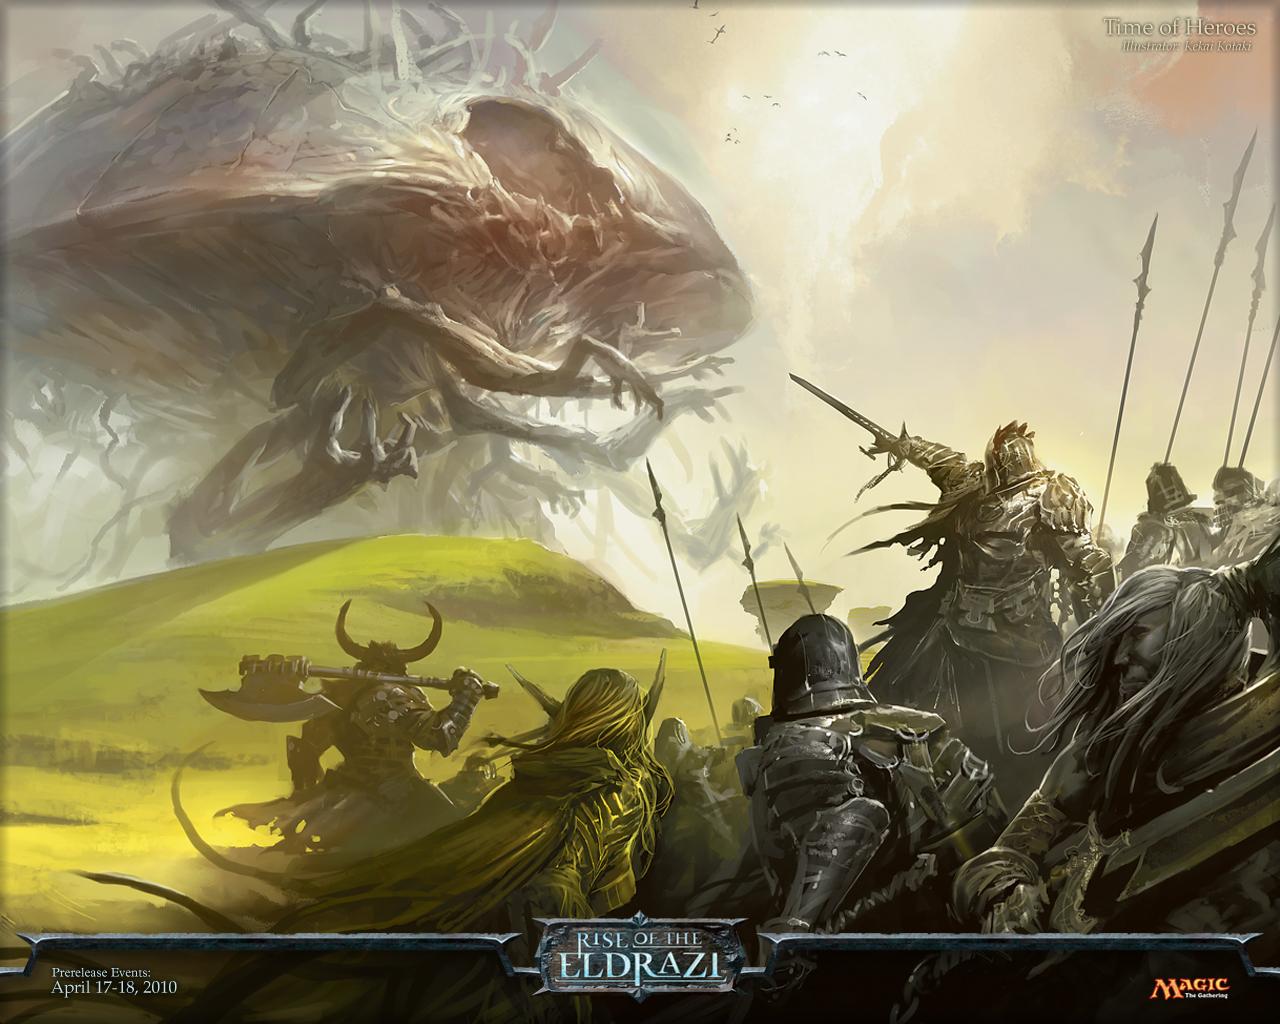 Rise of the Eldrazi Wallpaper 4 Wizards